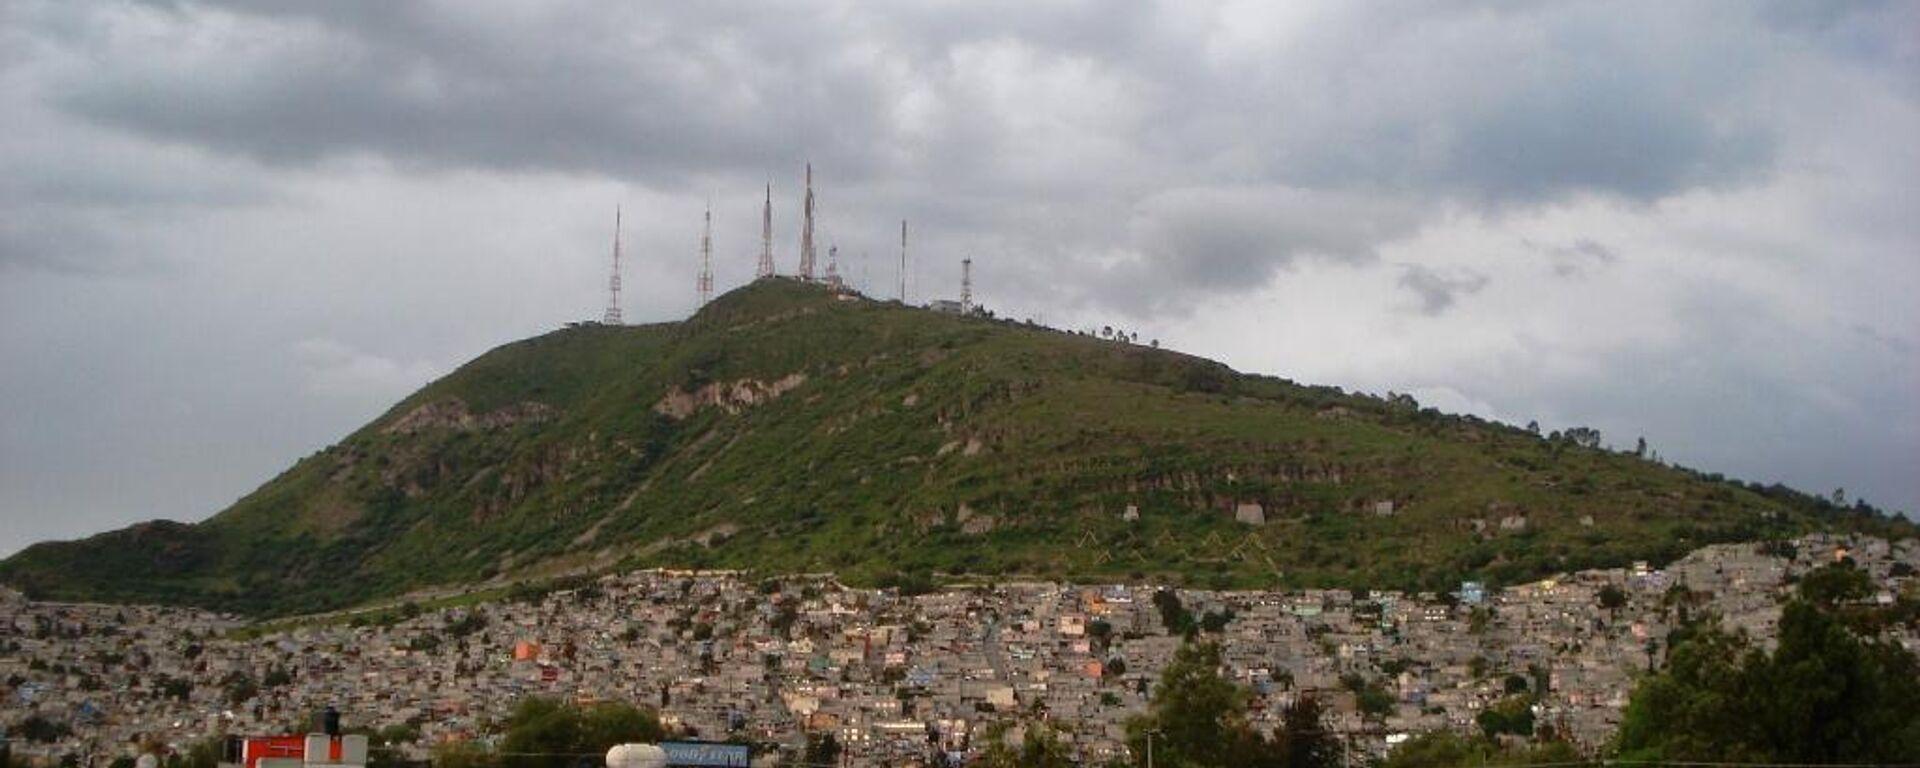 Cerro Chiquihuite en México  - Sputnik Mundo, 1920, 11.09.2021